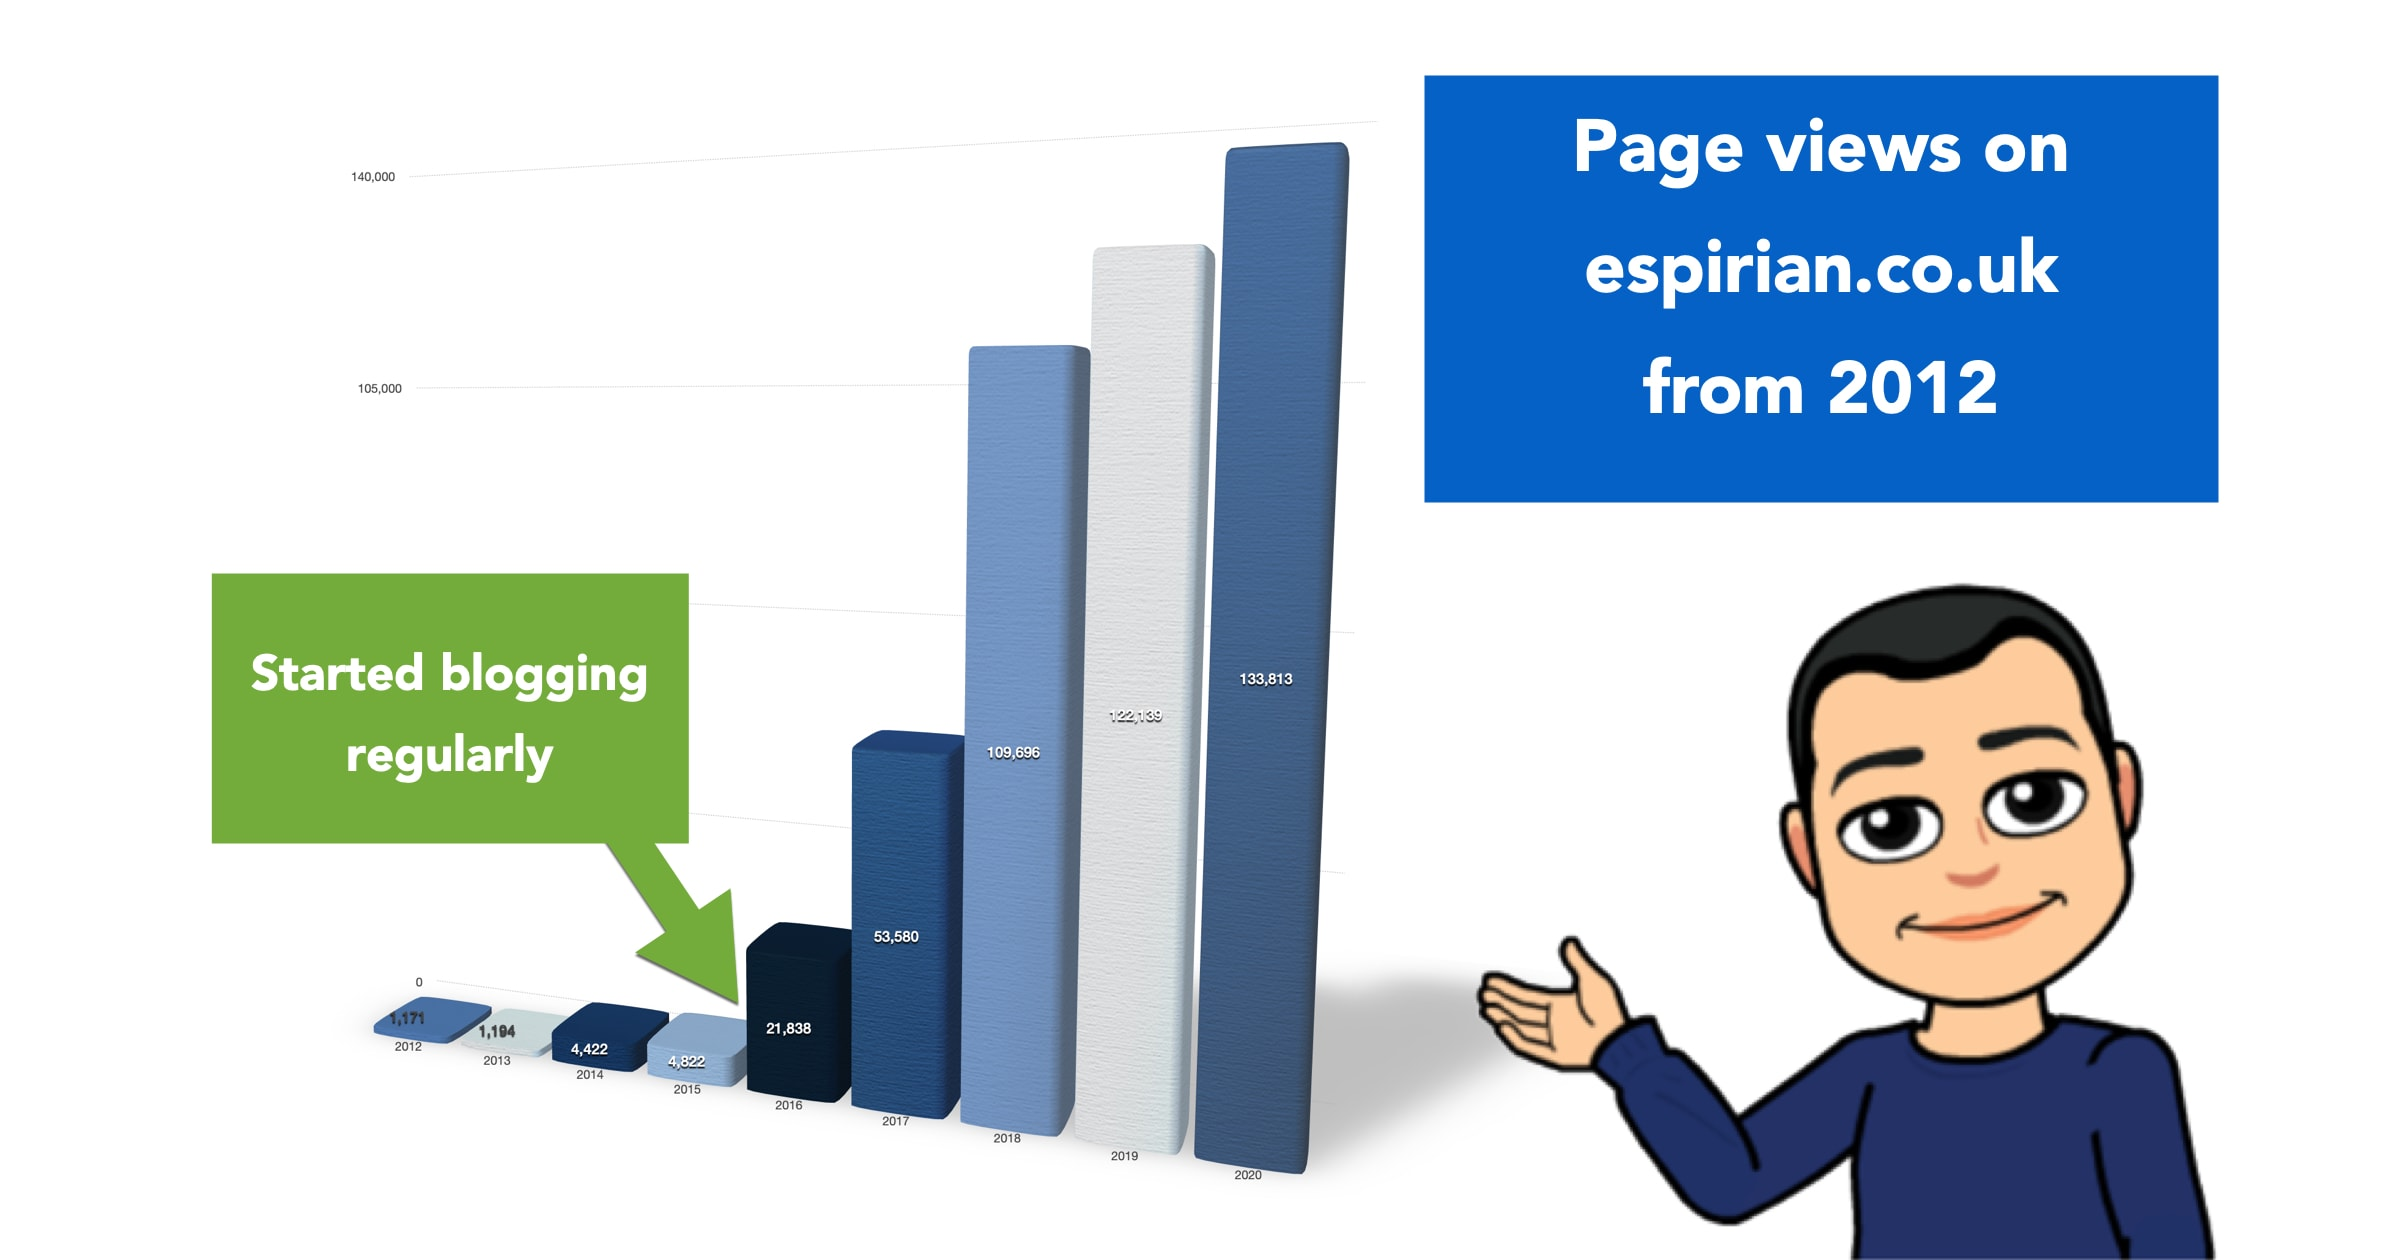 Web traffic stats on espirian.co.uk